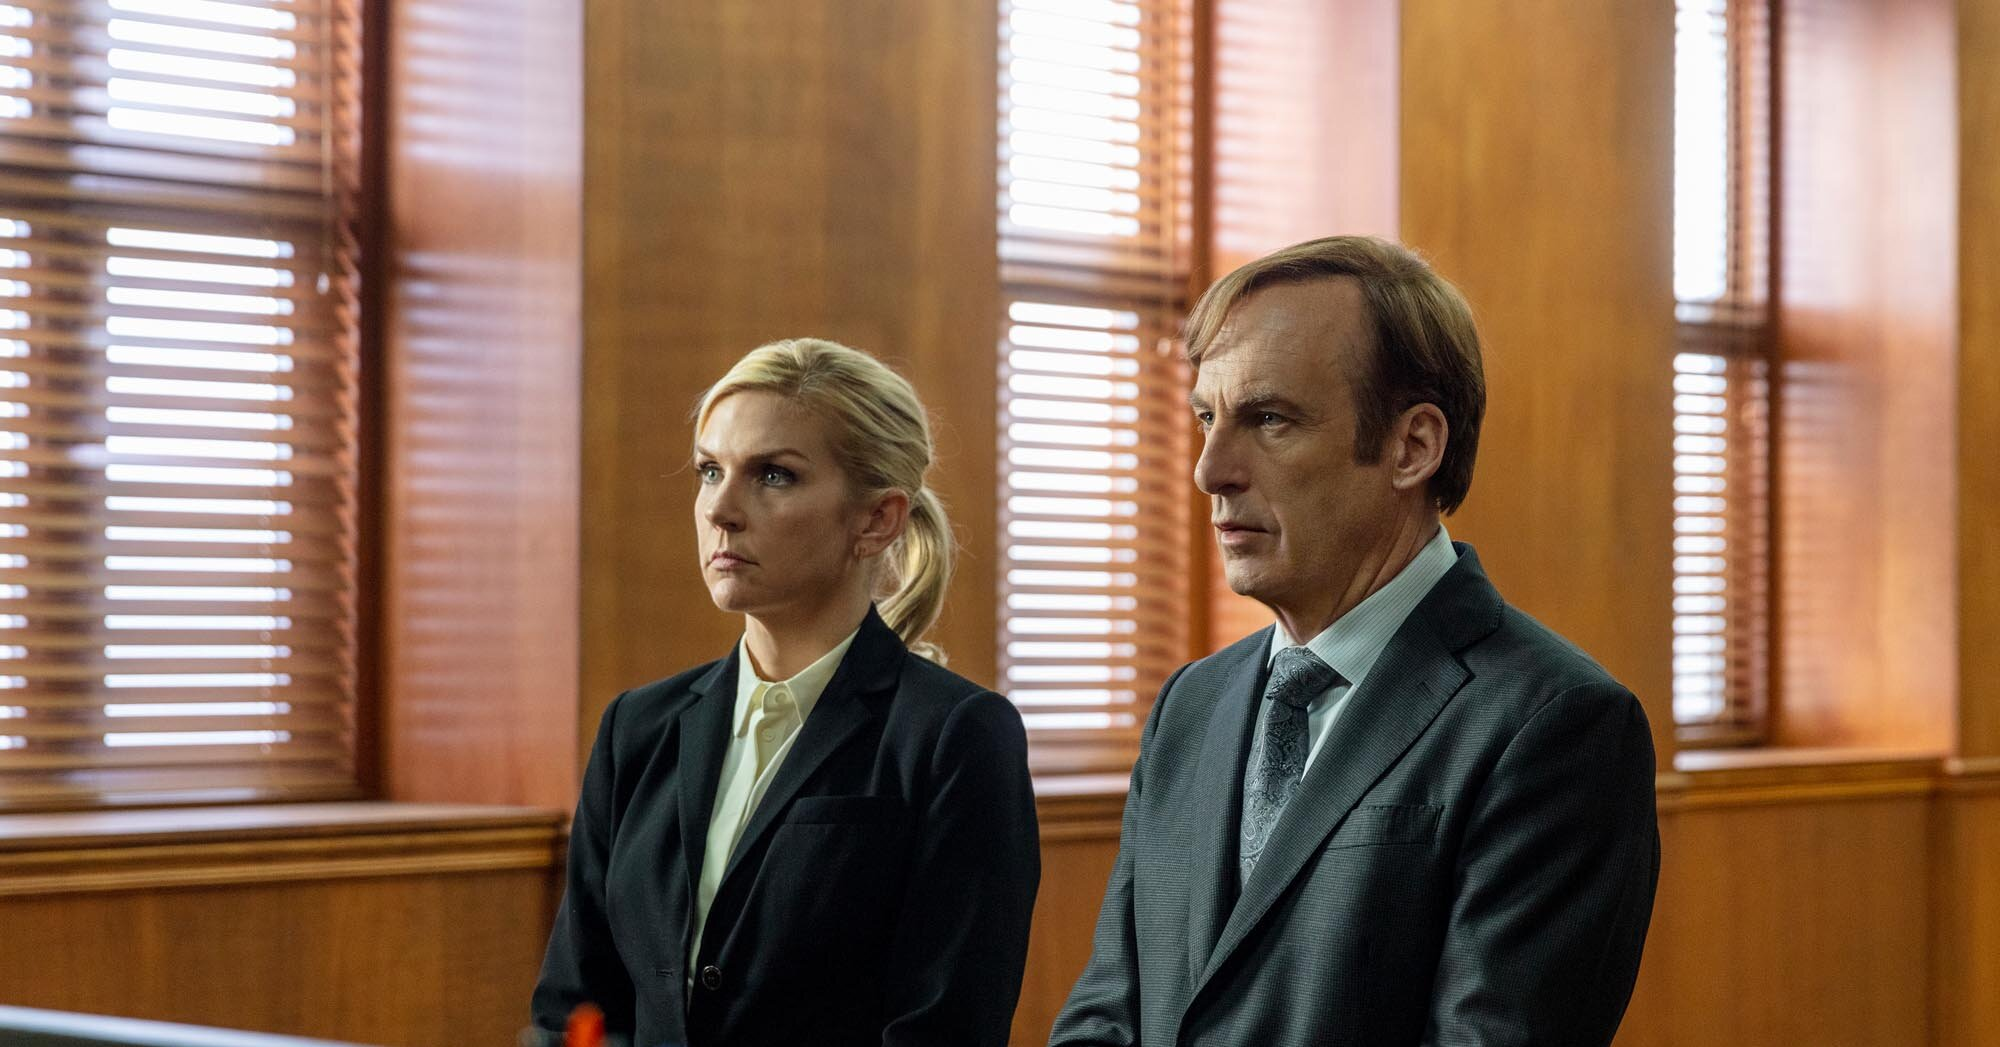 'Better Call Saul' boss reveals the big questions of the final season